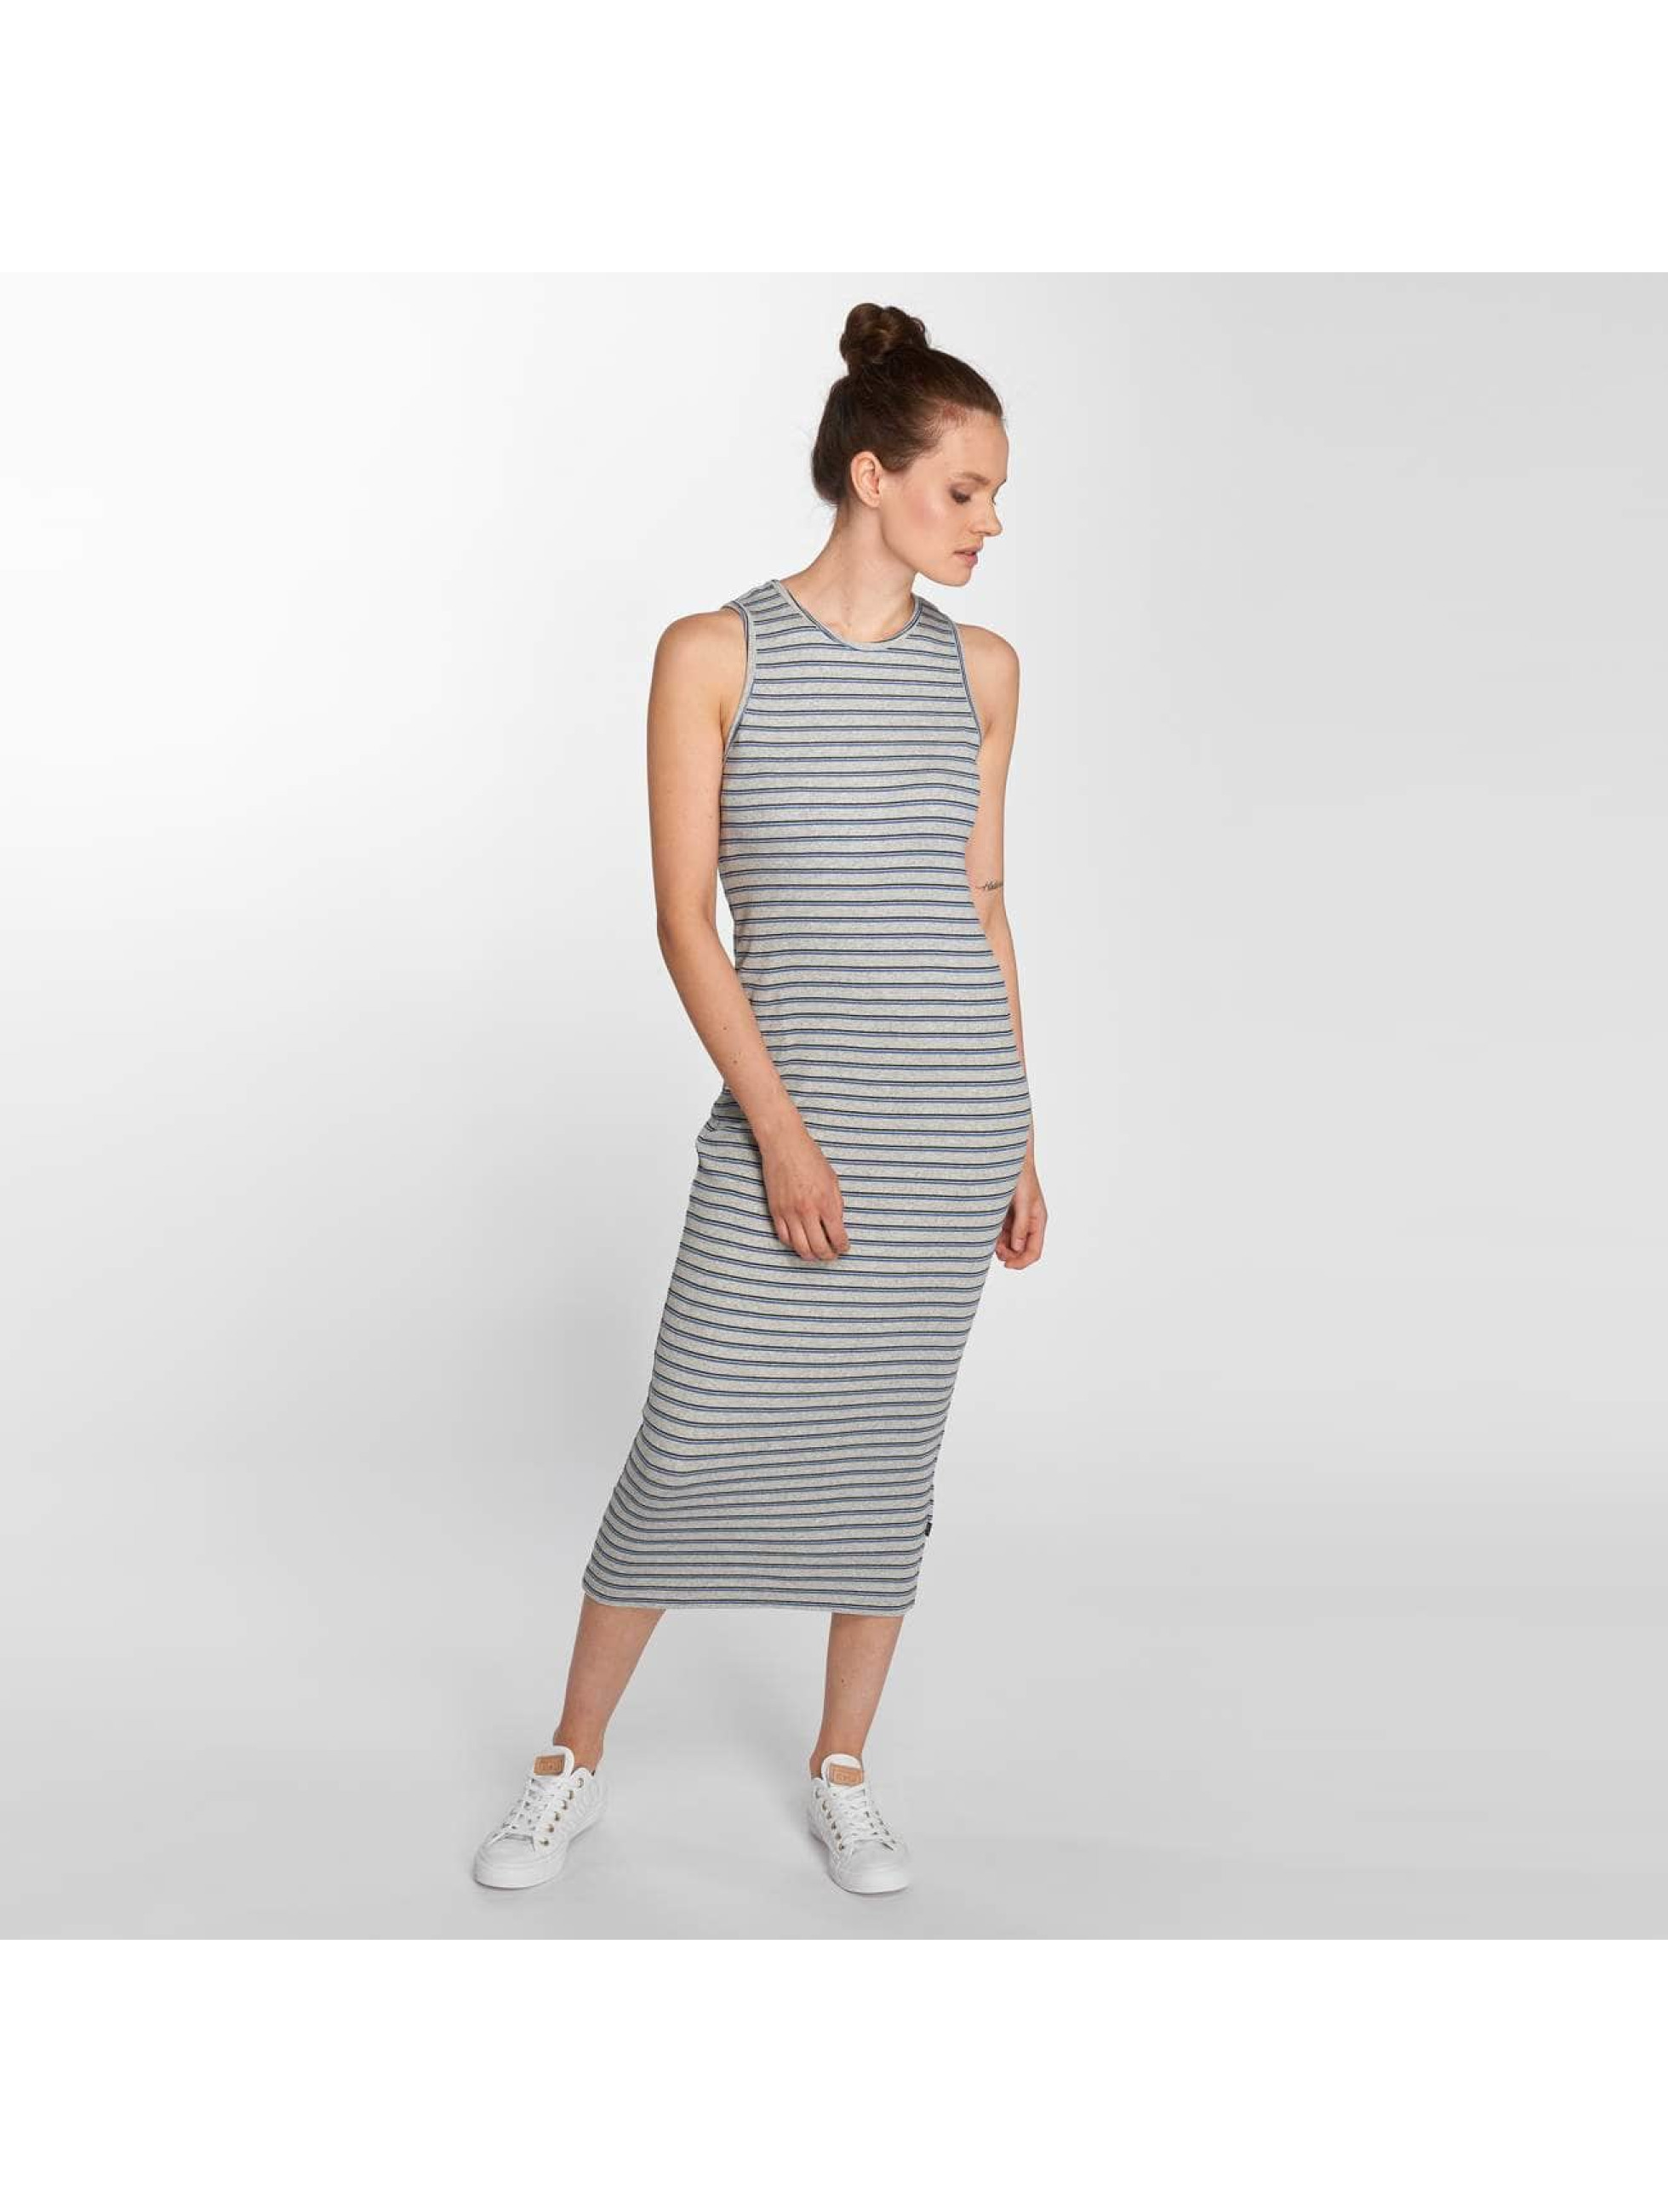 Lee jurk Jersey grijs